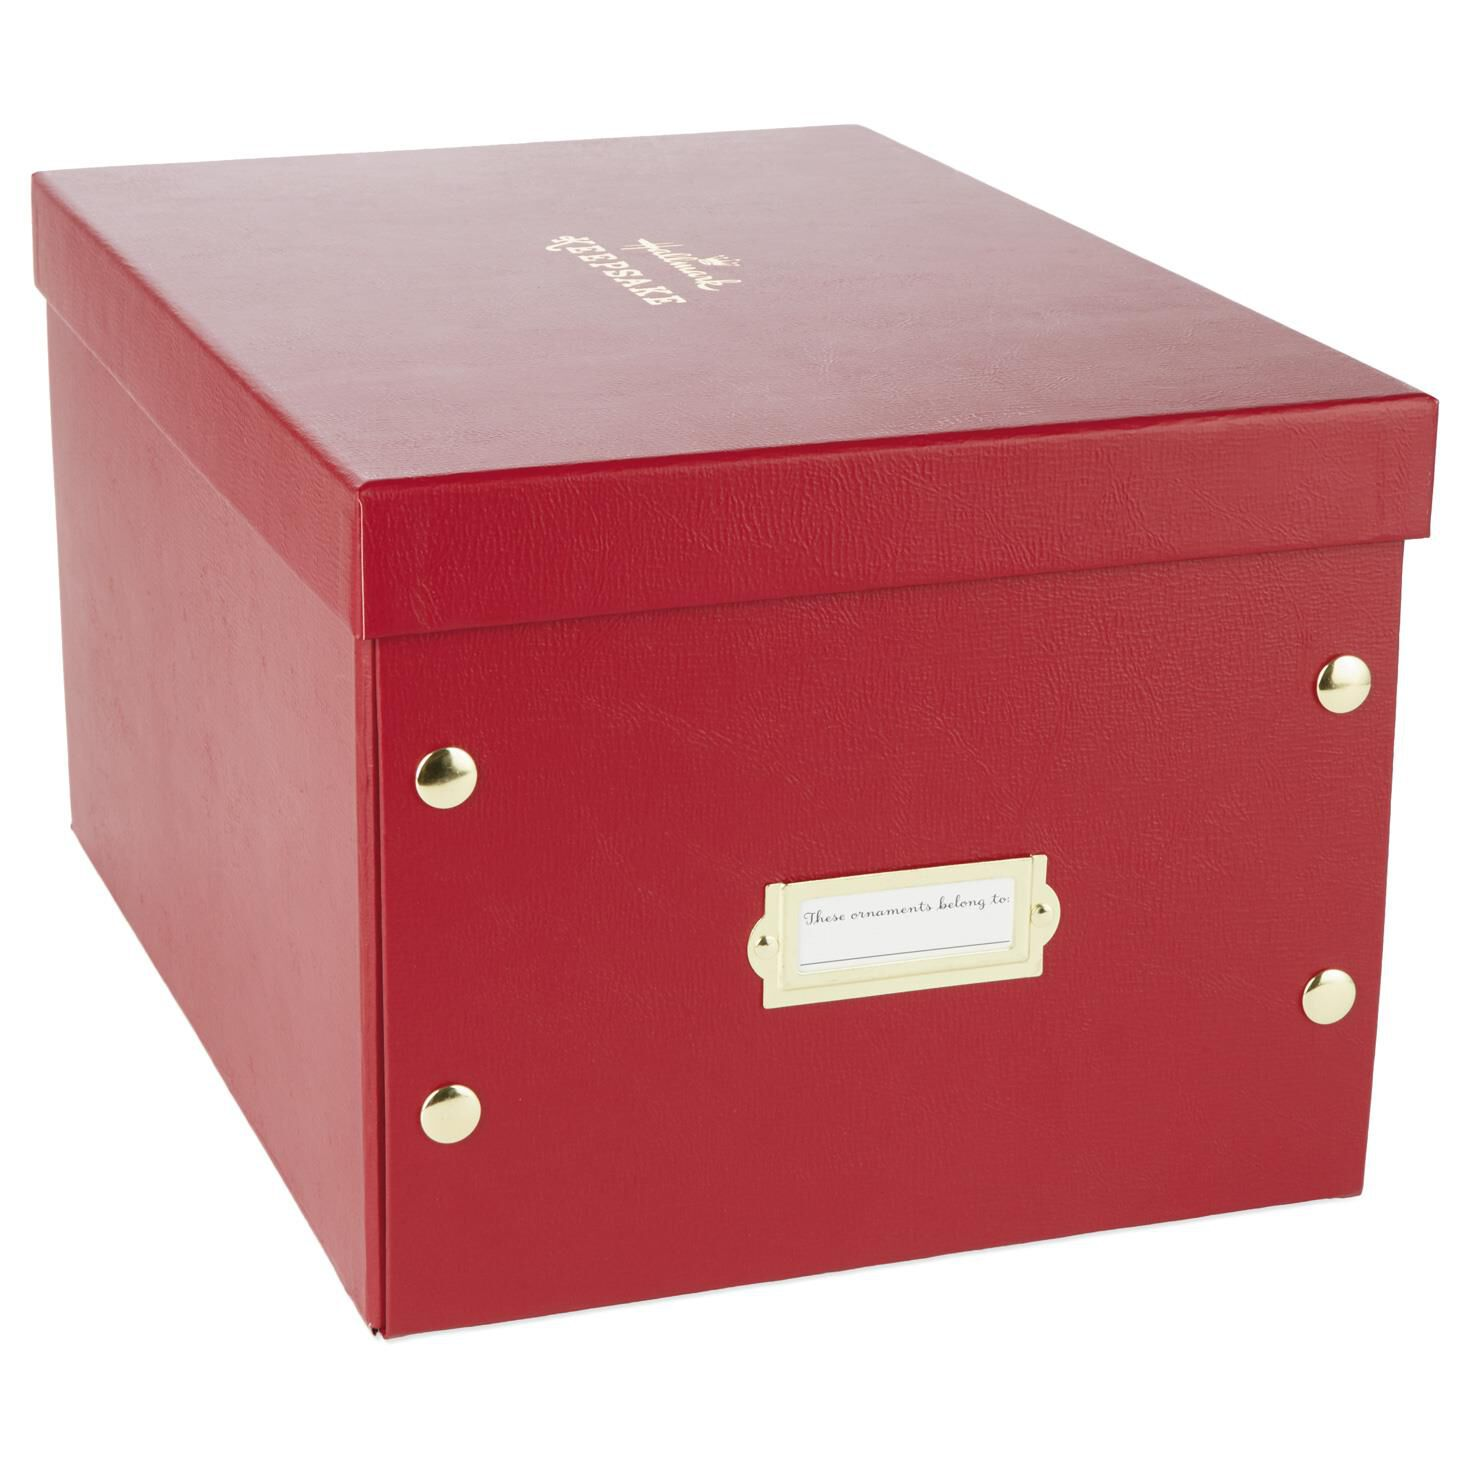 Milestones And Memories Ornament Storage Box Keepsake Ornaments